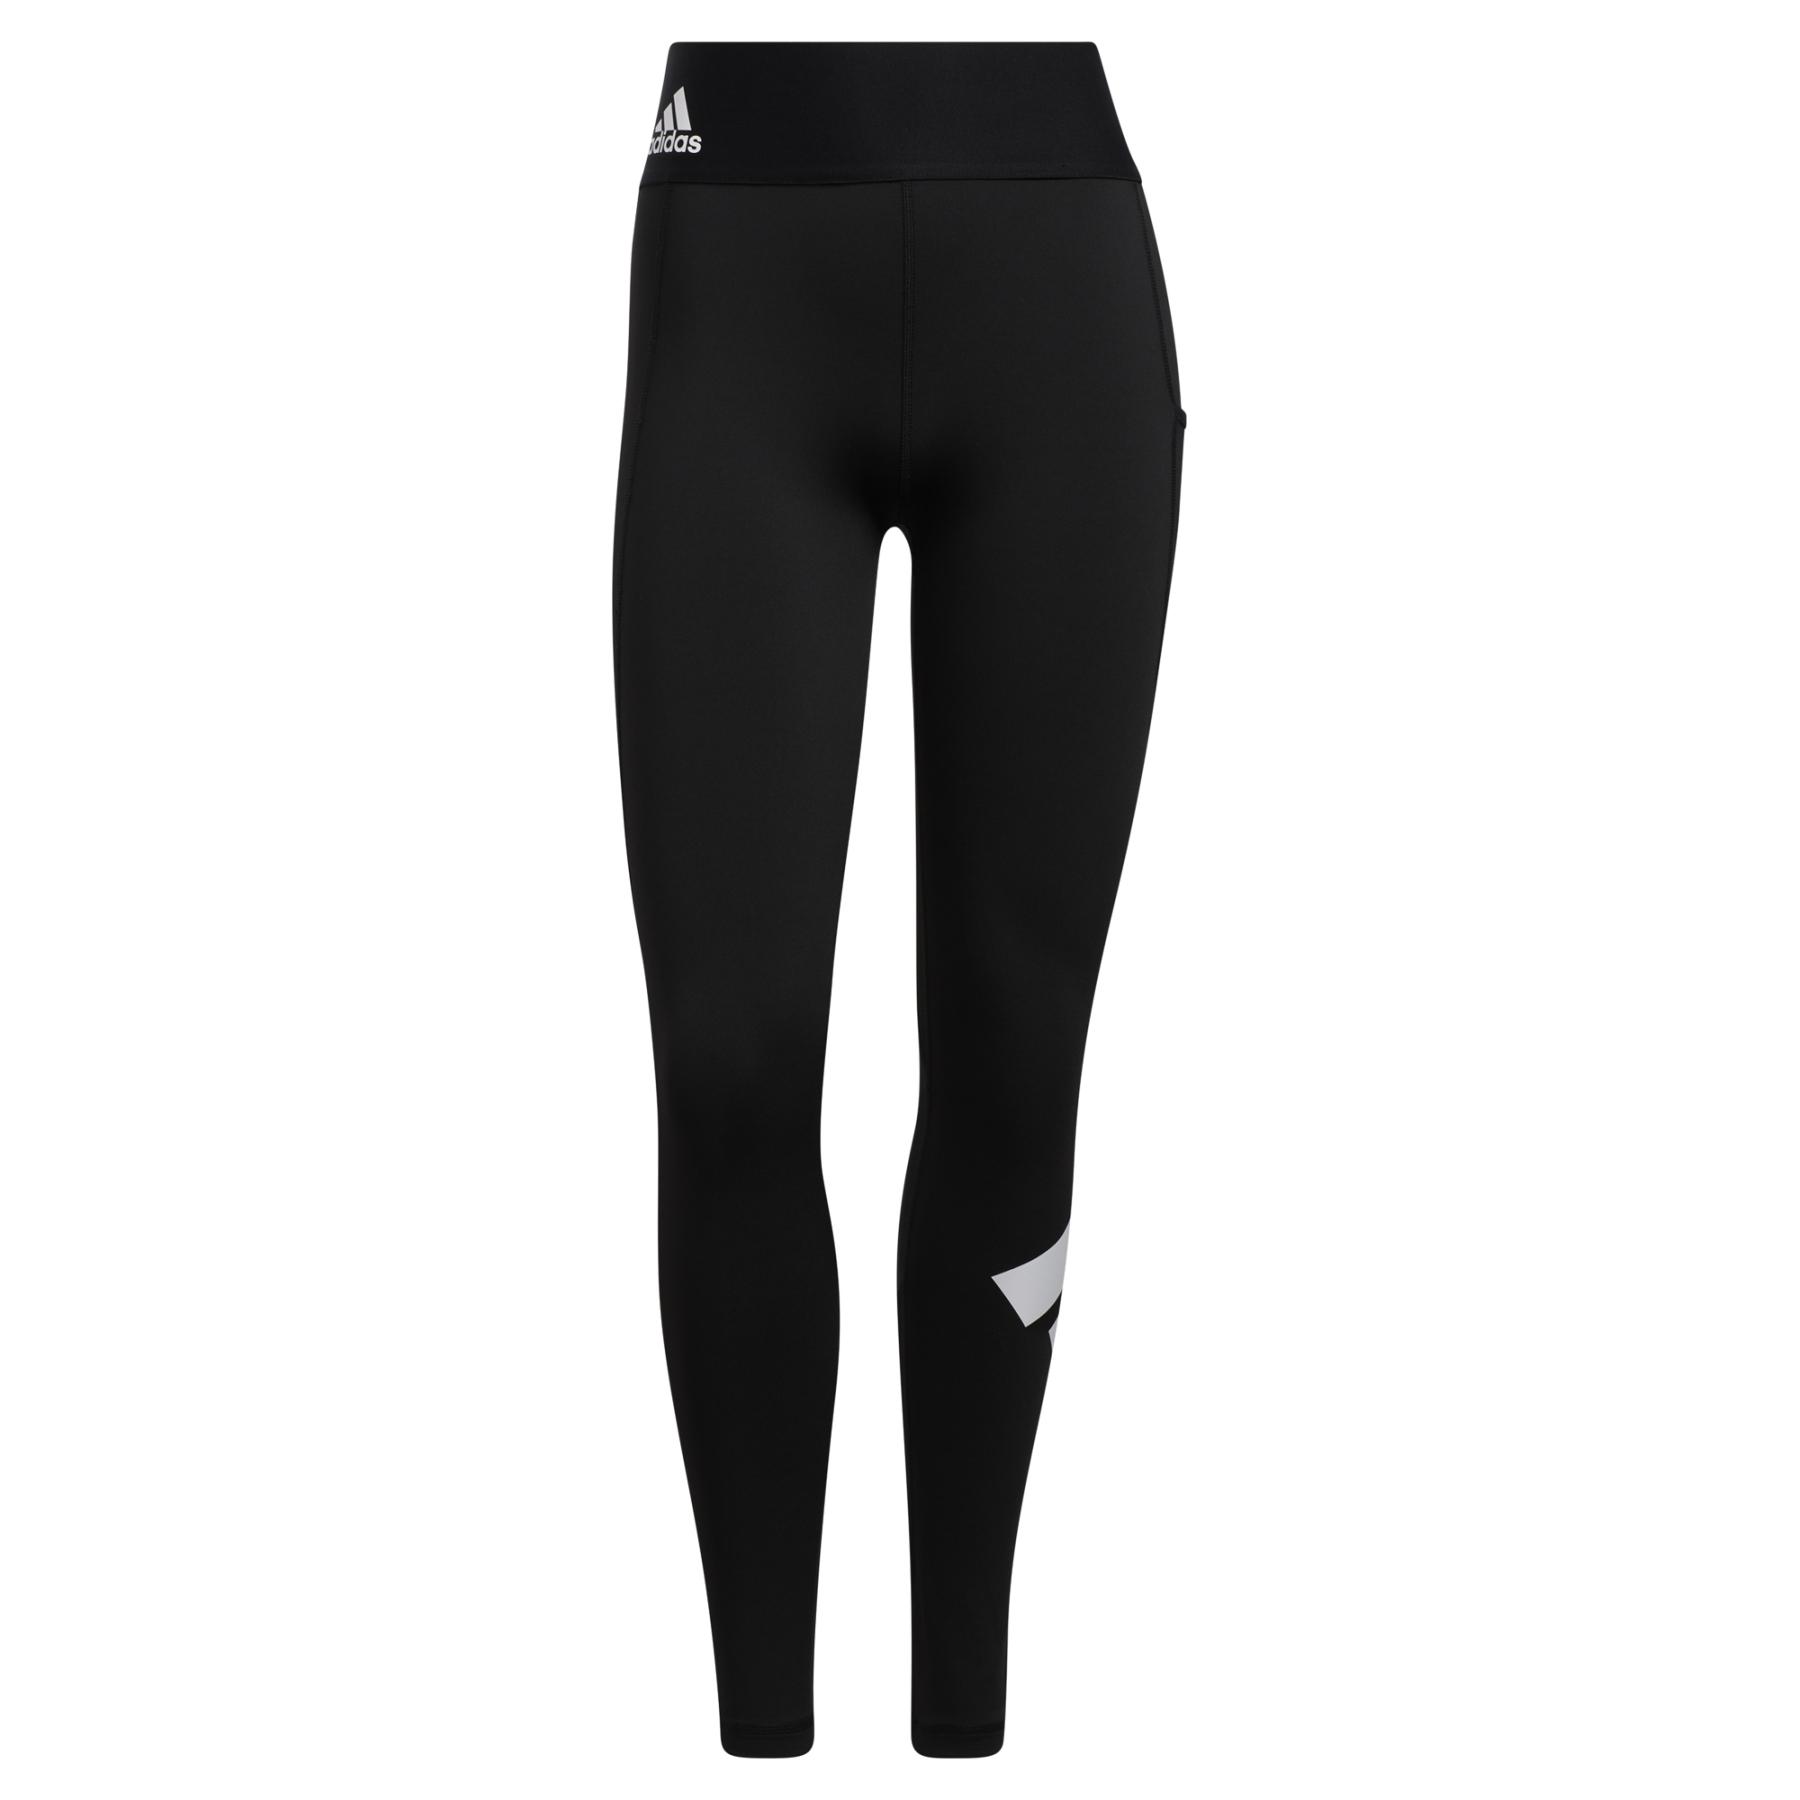 adidas Women's Techfit Logo Tights - Short - black/white GR8046